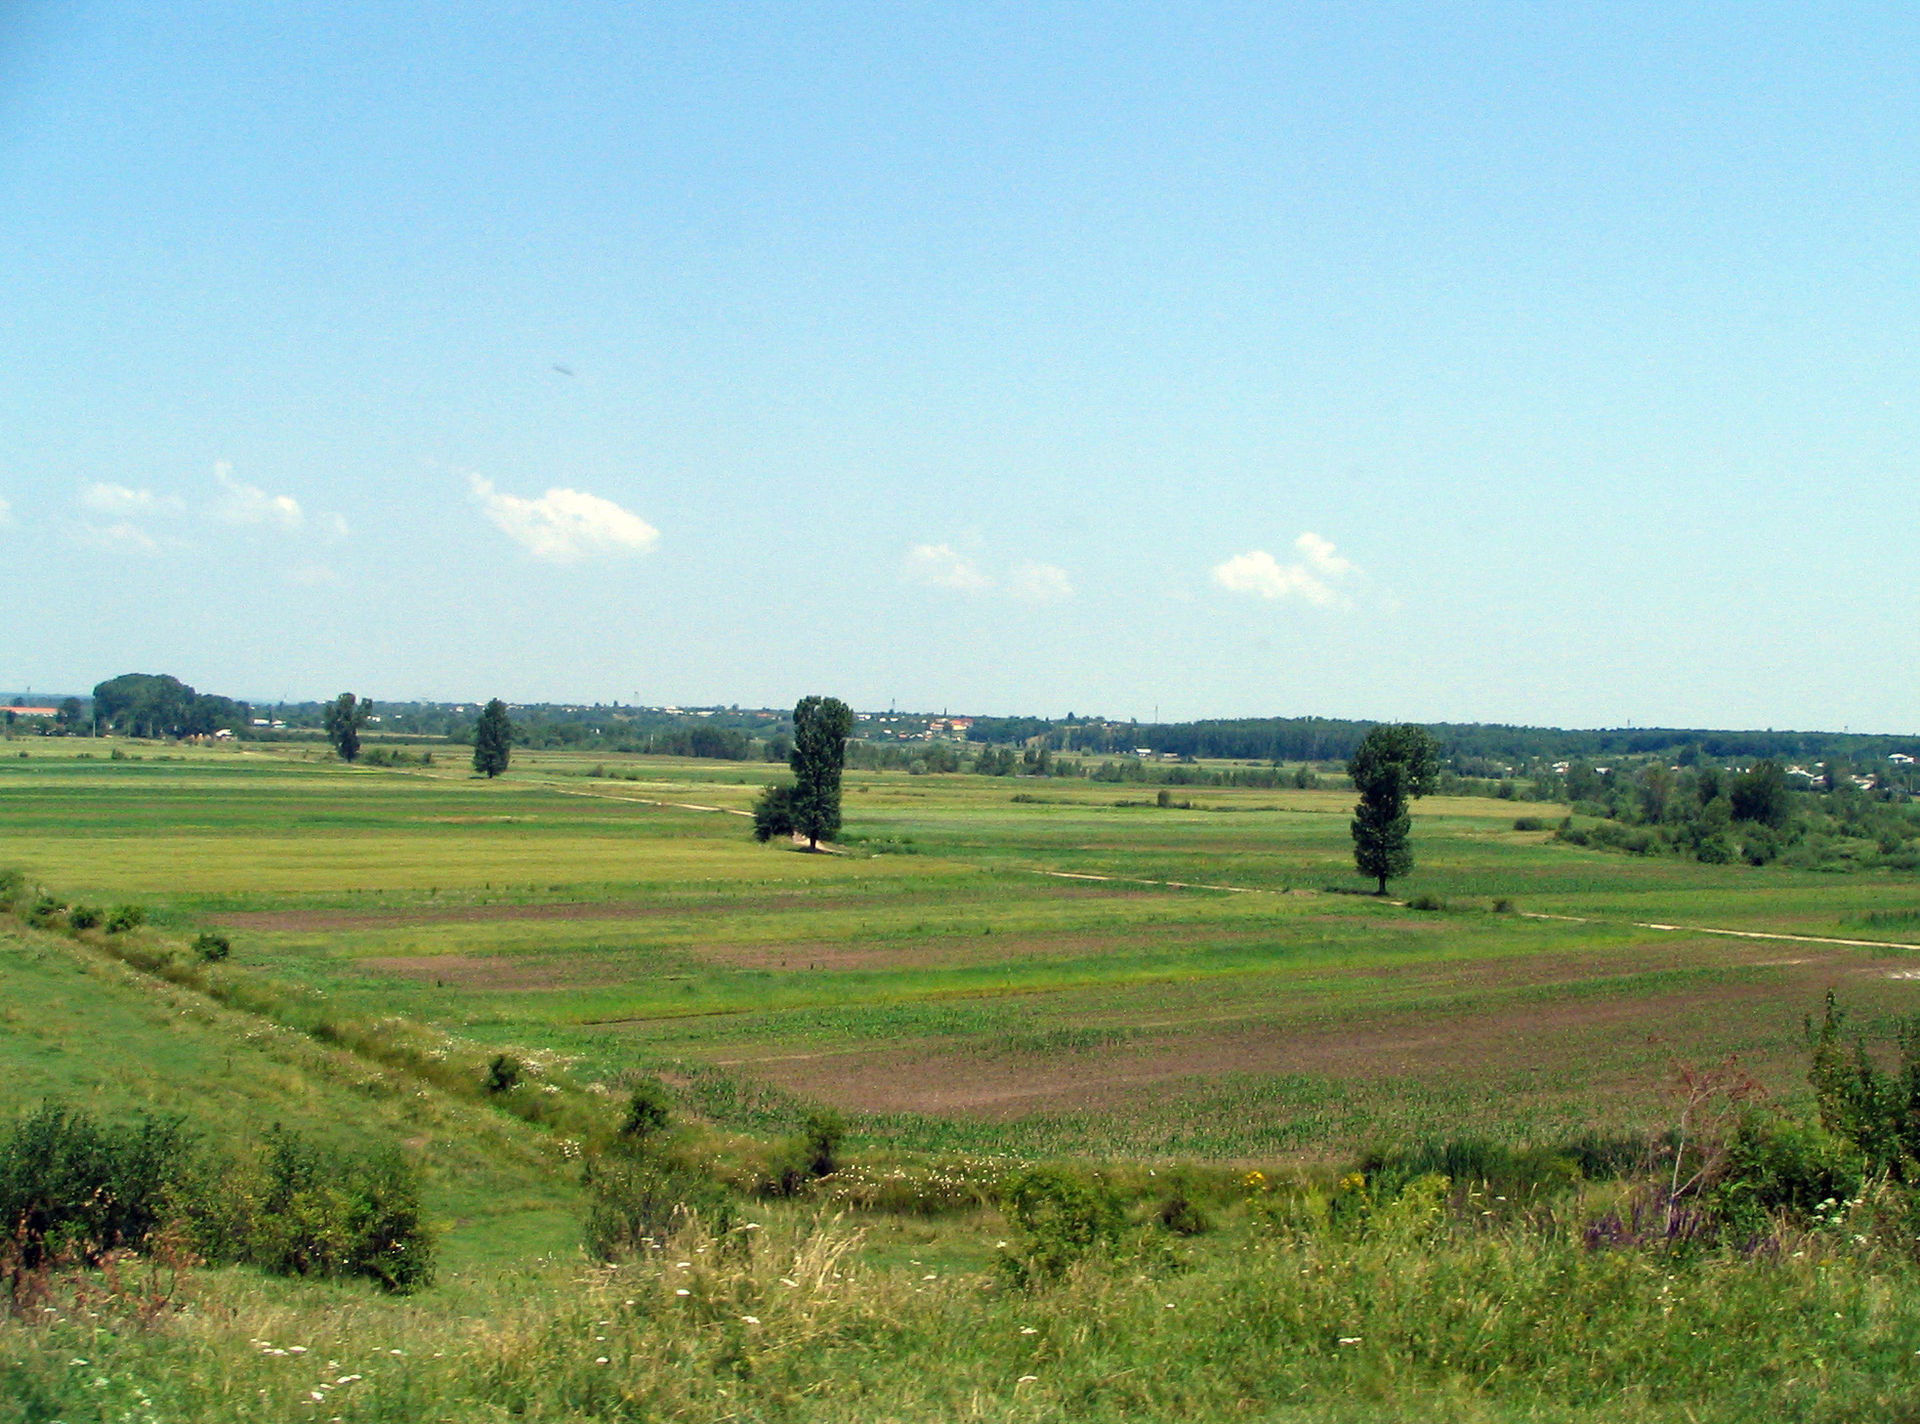 https://upload.wikimedia.org/wikipedia/commons/thumb/e/e2/Arge%C5%9F_County_Romania_bgiu.jpg/1920px-Arge%C5%9F_County_Romania_bgiu.jpg?1563199510565